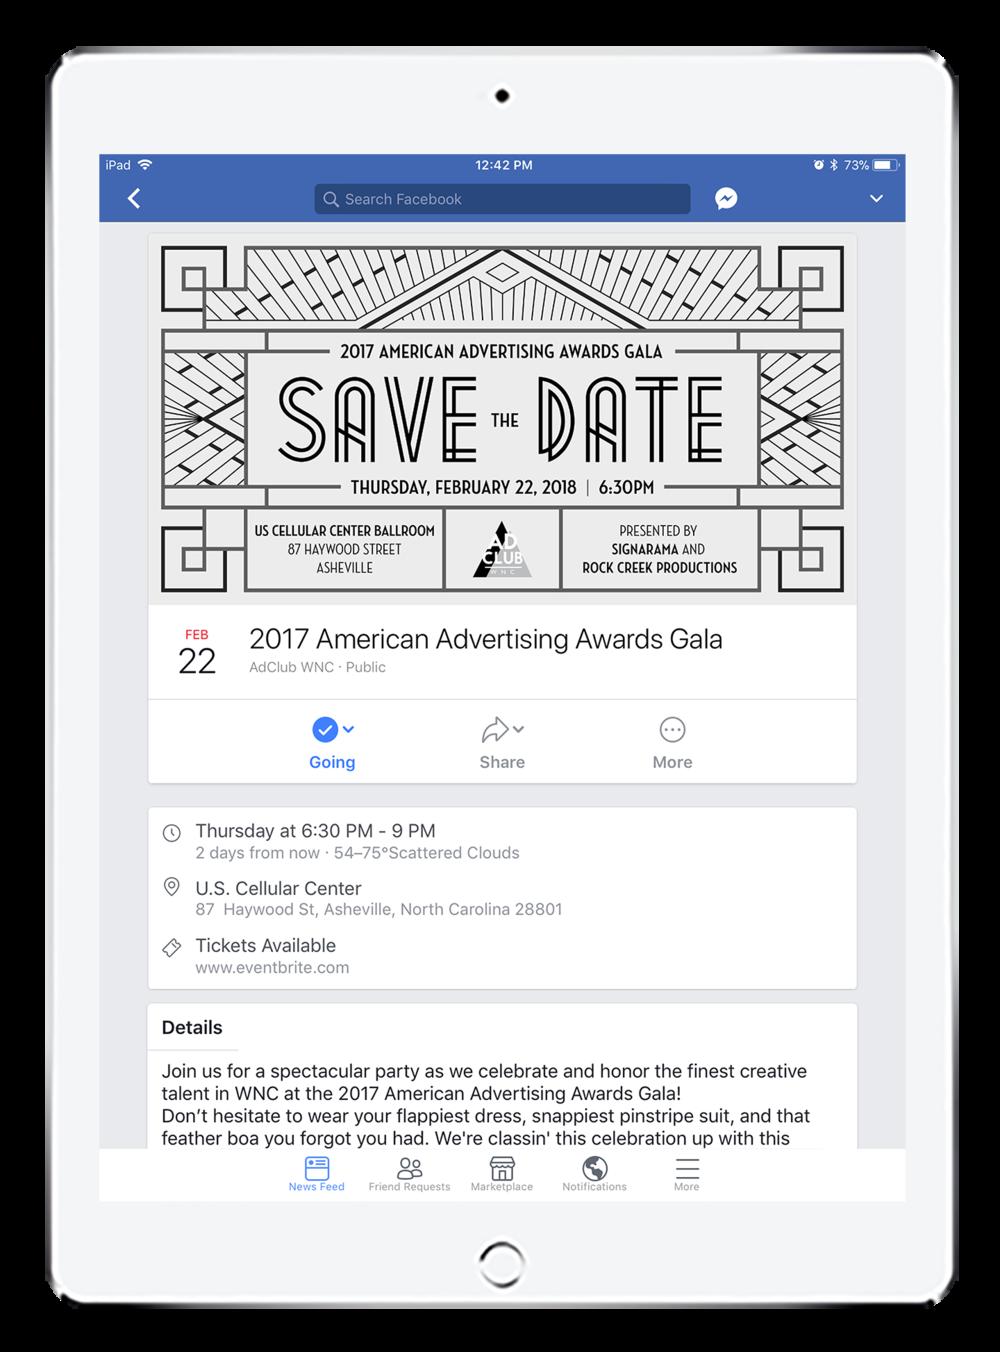 adclub_wnc_awards_facebook_ipad.png